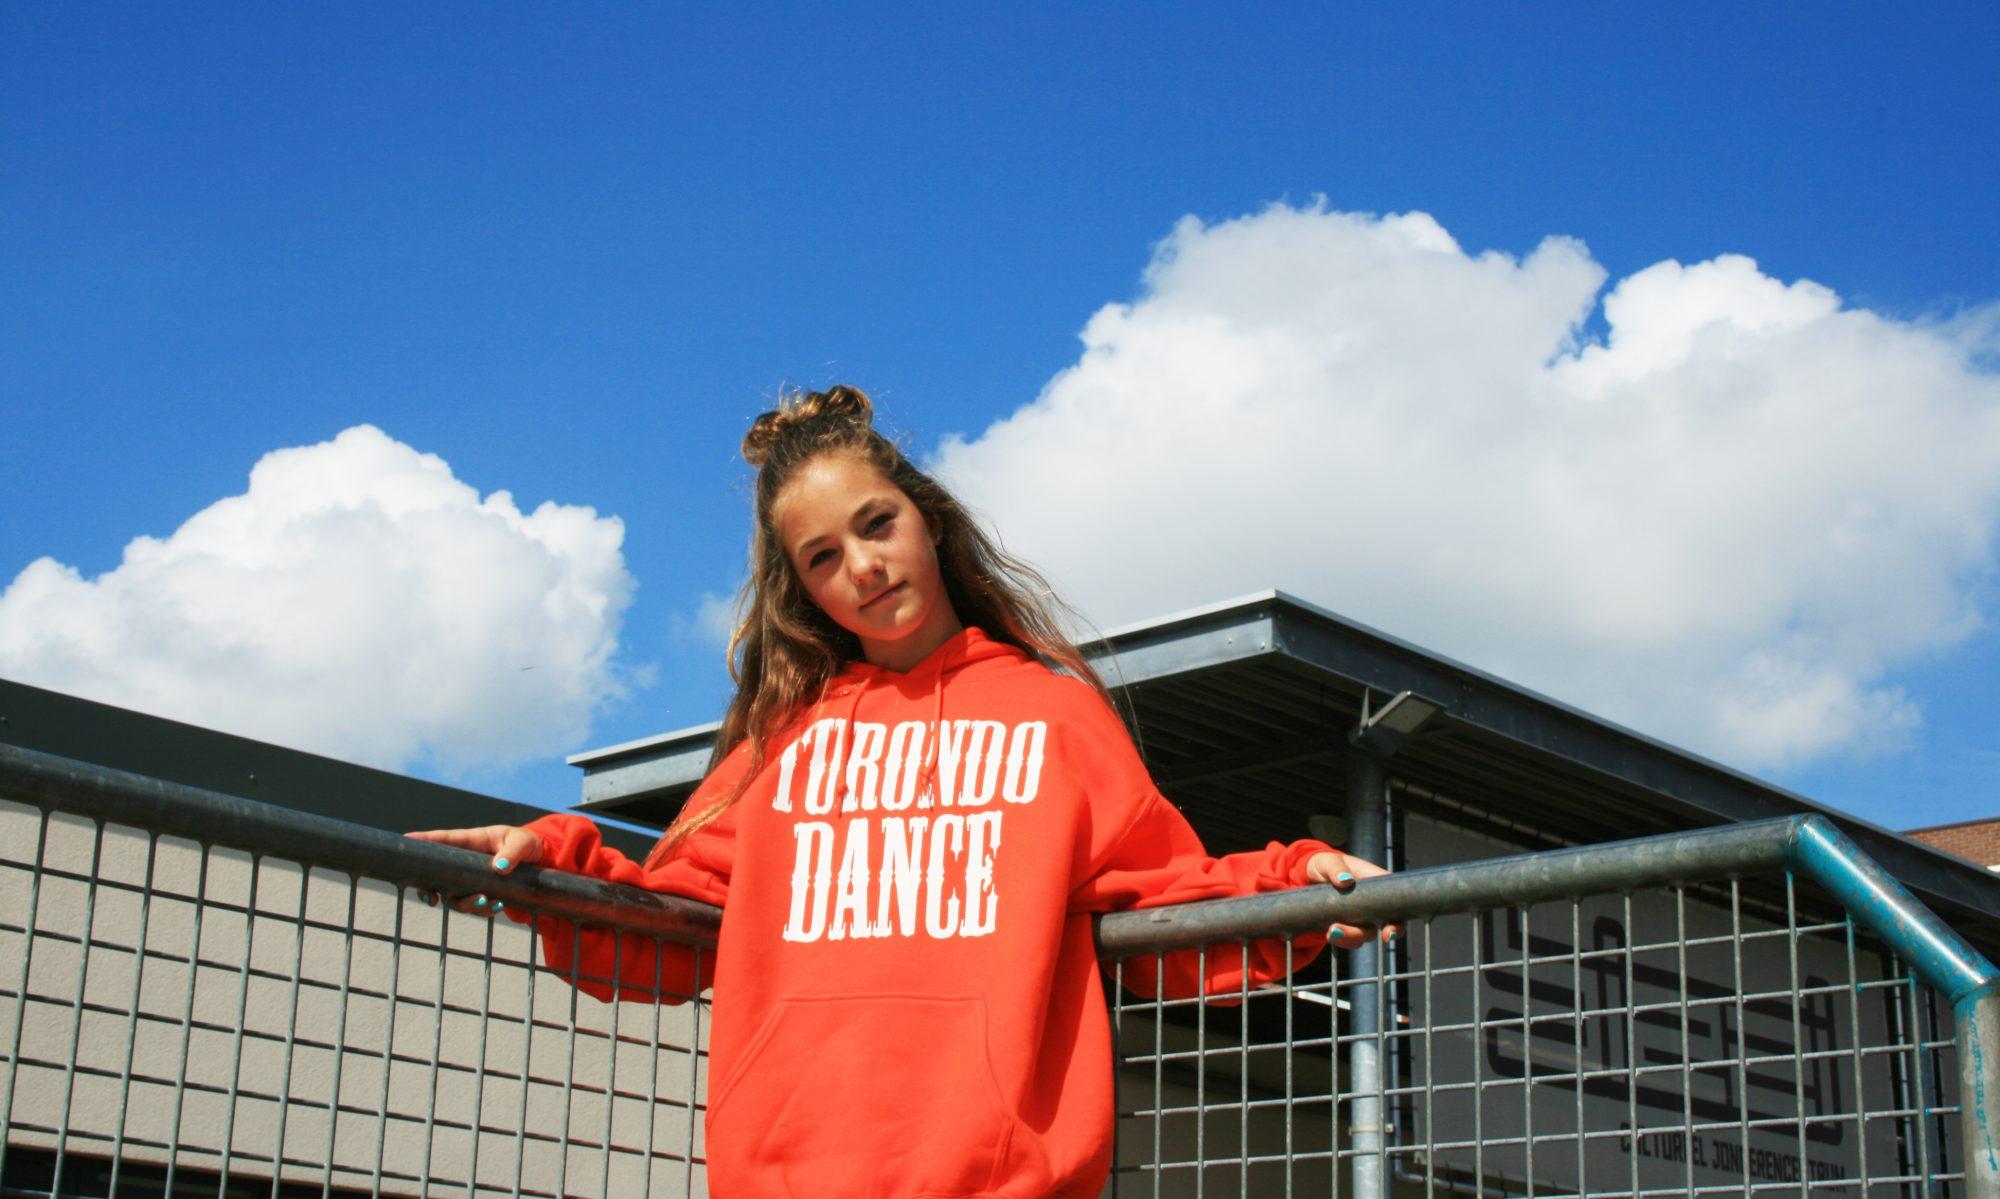 Turondo Dance